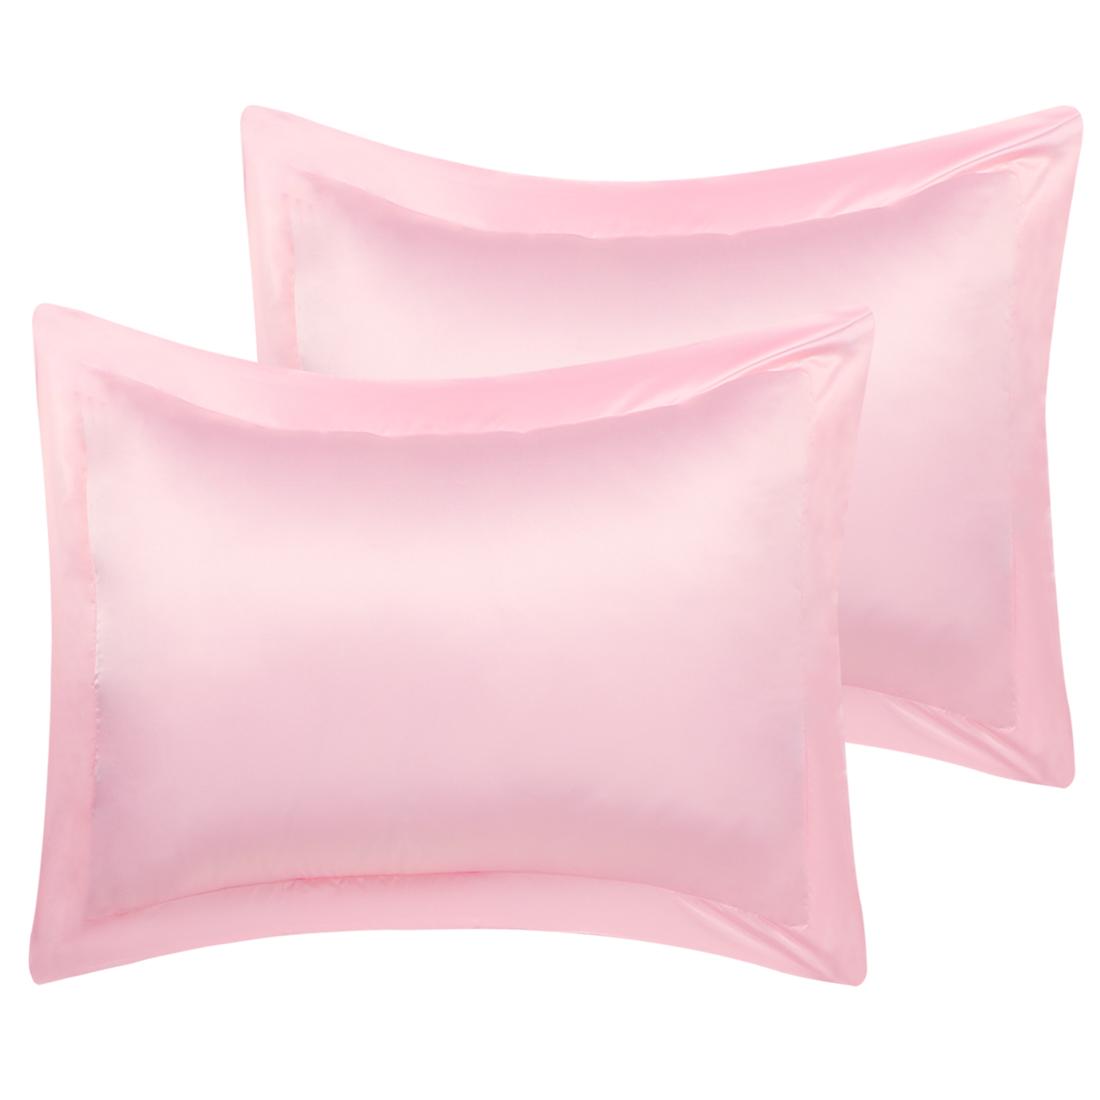 2 Pcs Peach Pillow Shams Satin Pillow Cases Boudoir Oxford Pillowcases